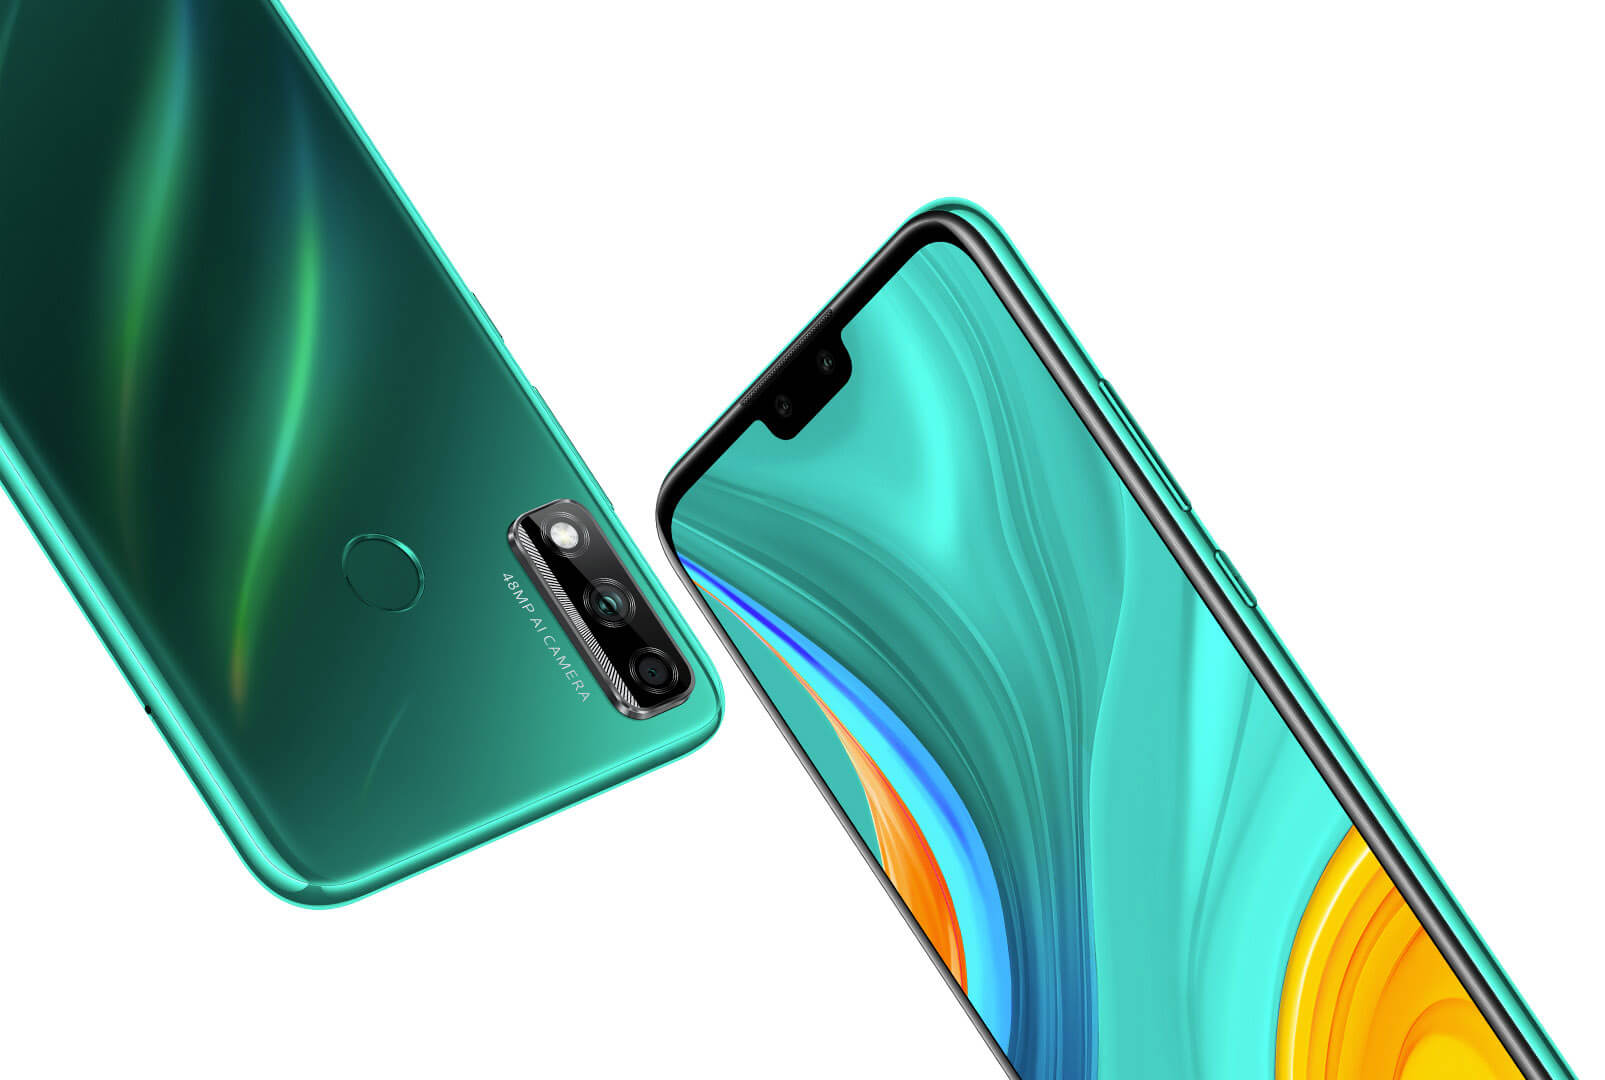 Huawei memperkenalkan tiga siri điện thoại pintar bajet Y 2